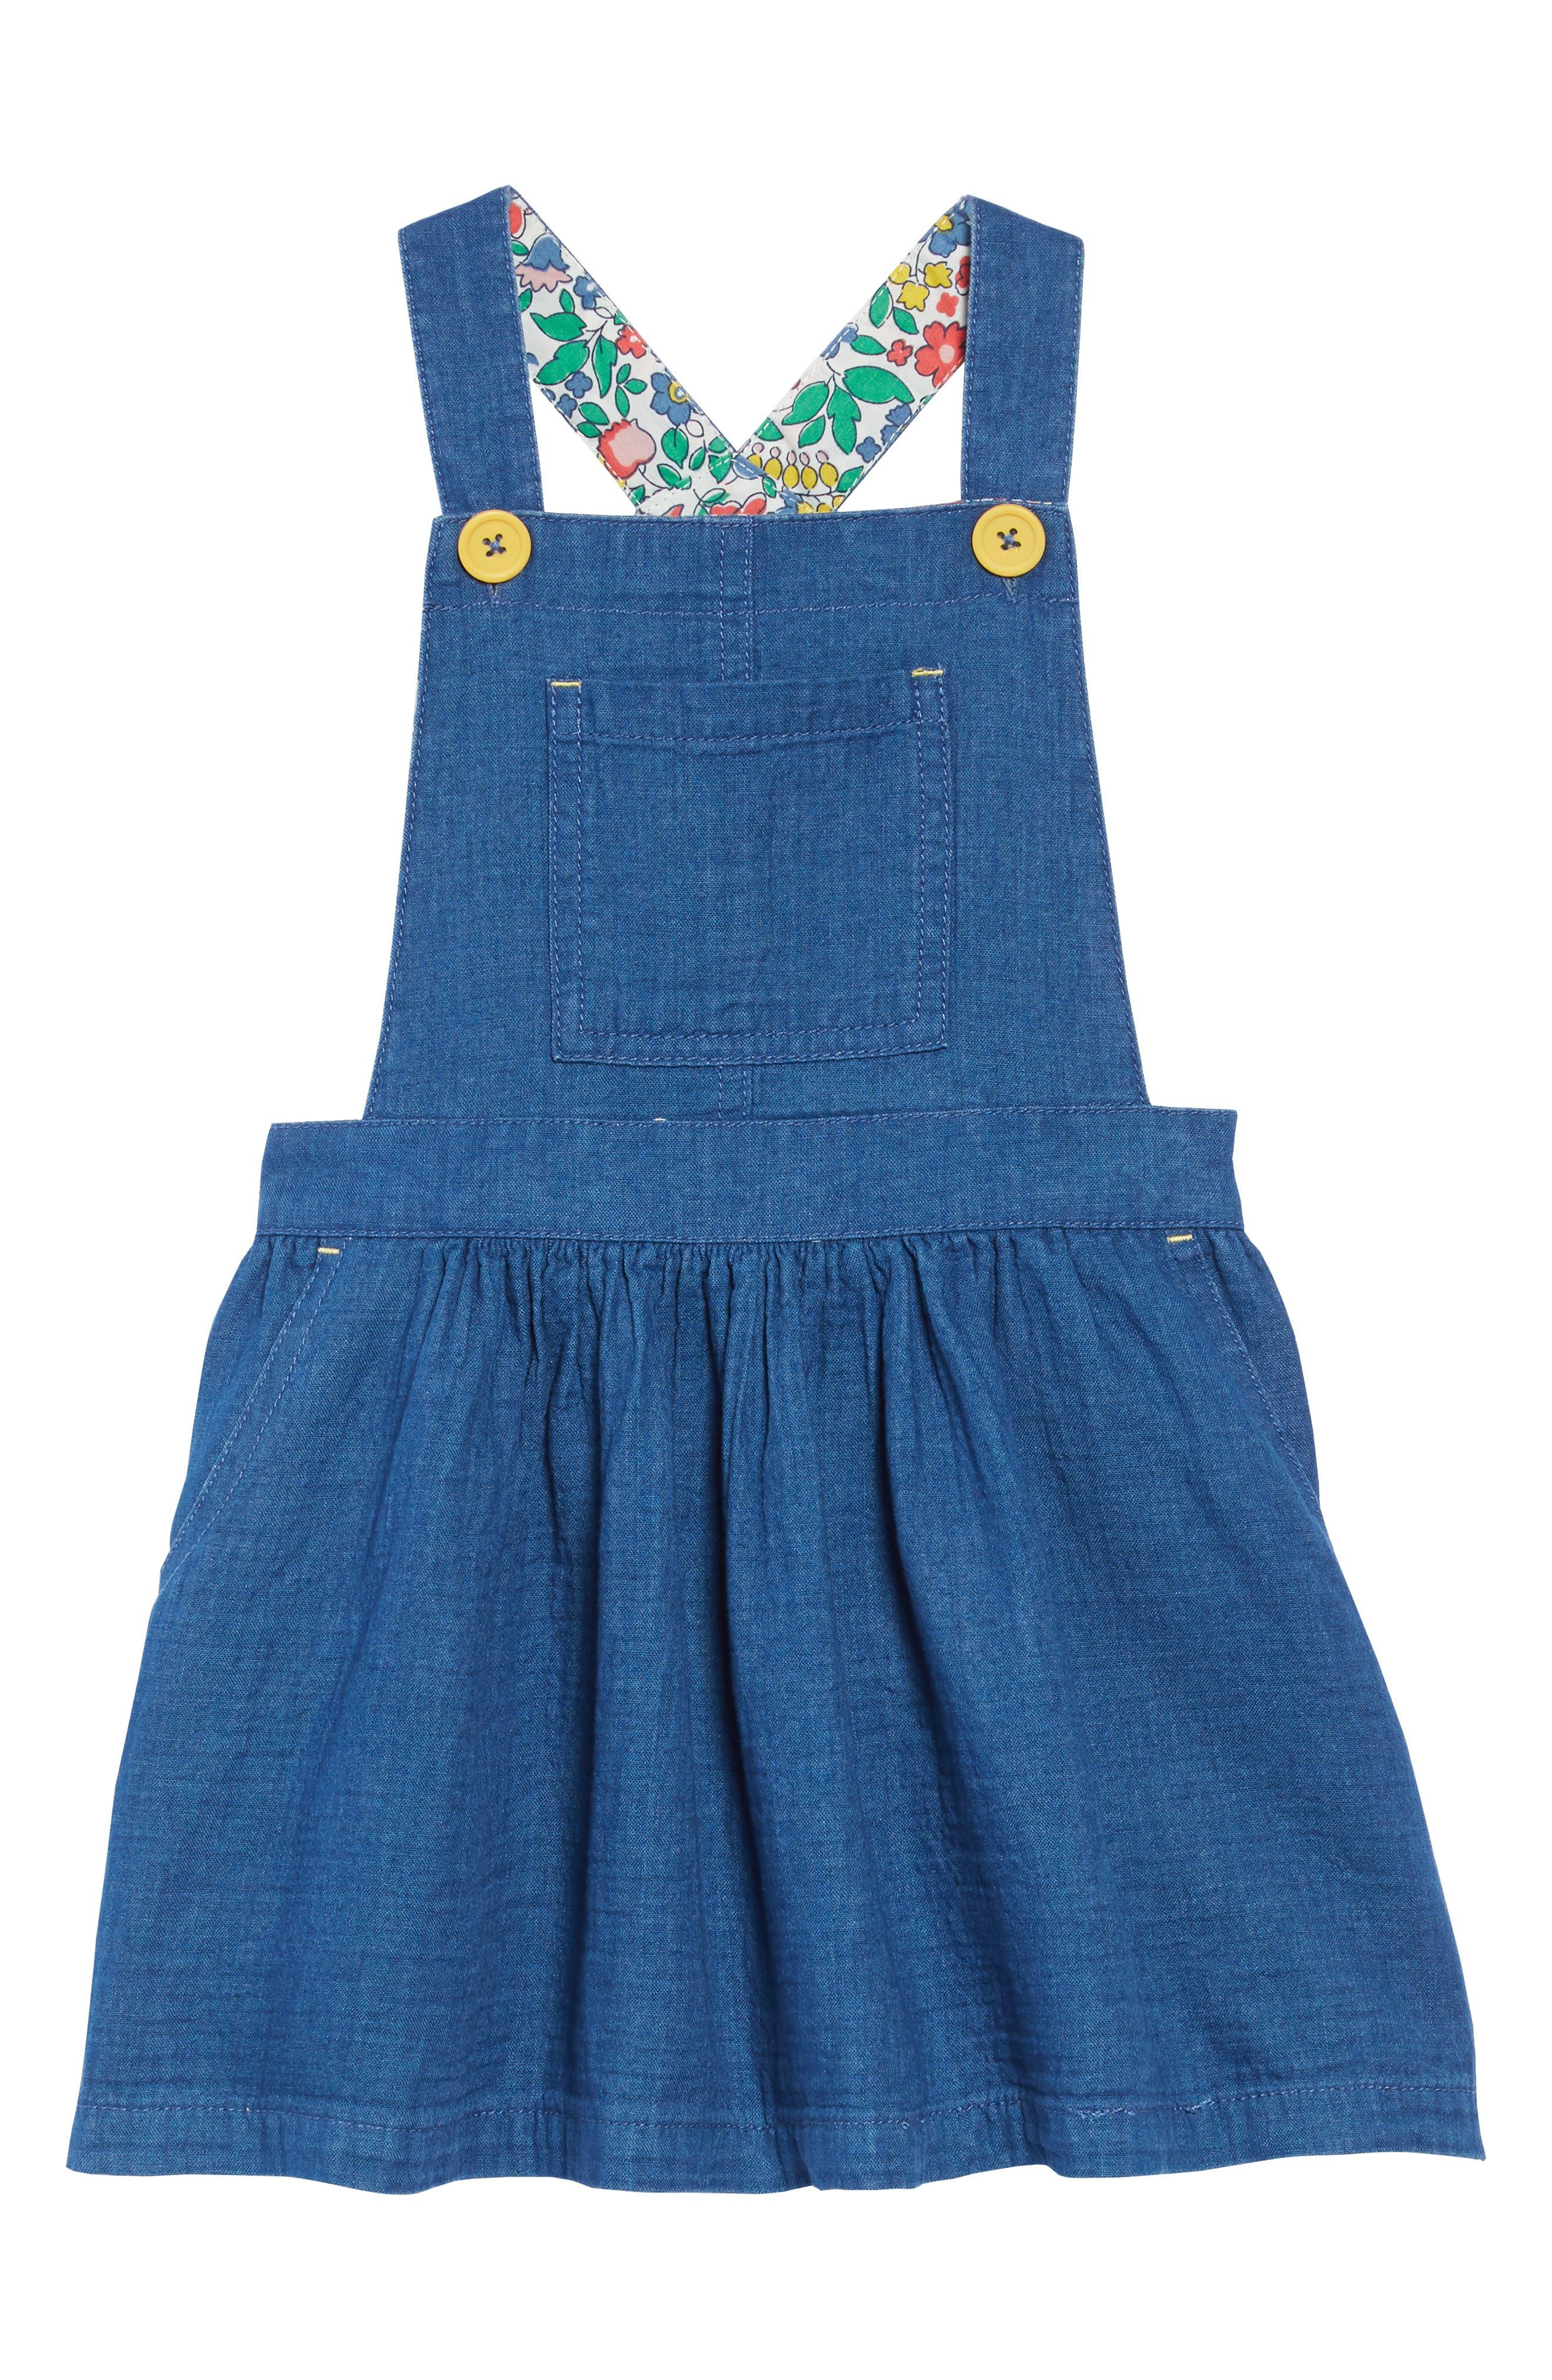 Dungaree Overall Dress,                             Main thumbnail 1, color,                             INDIGO BLUE